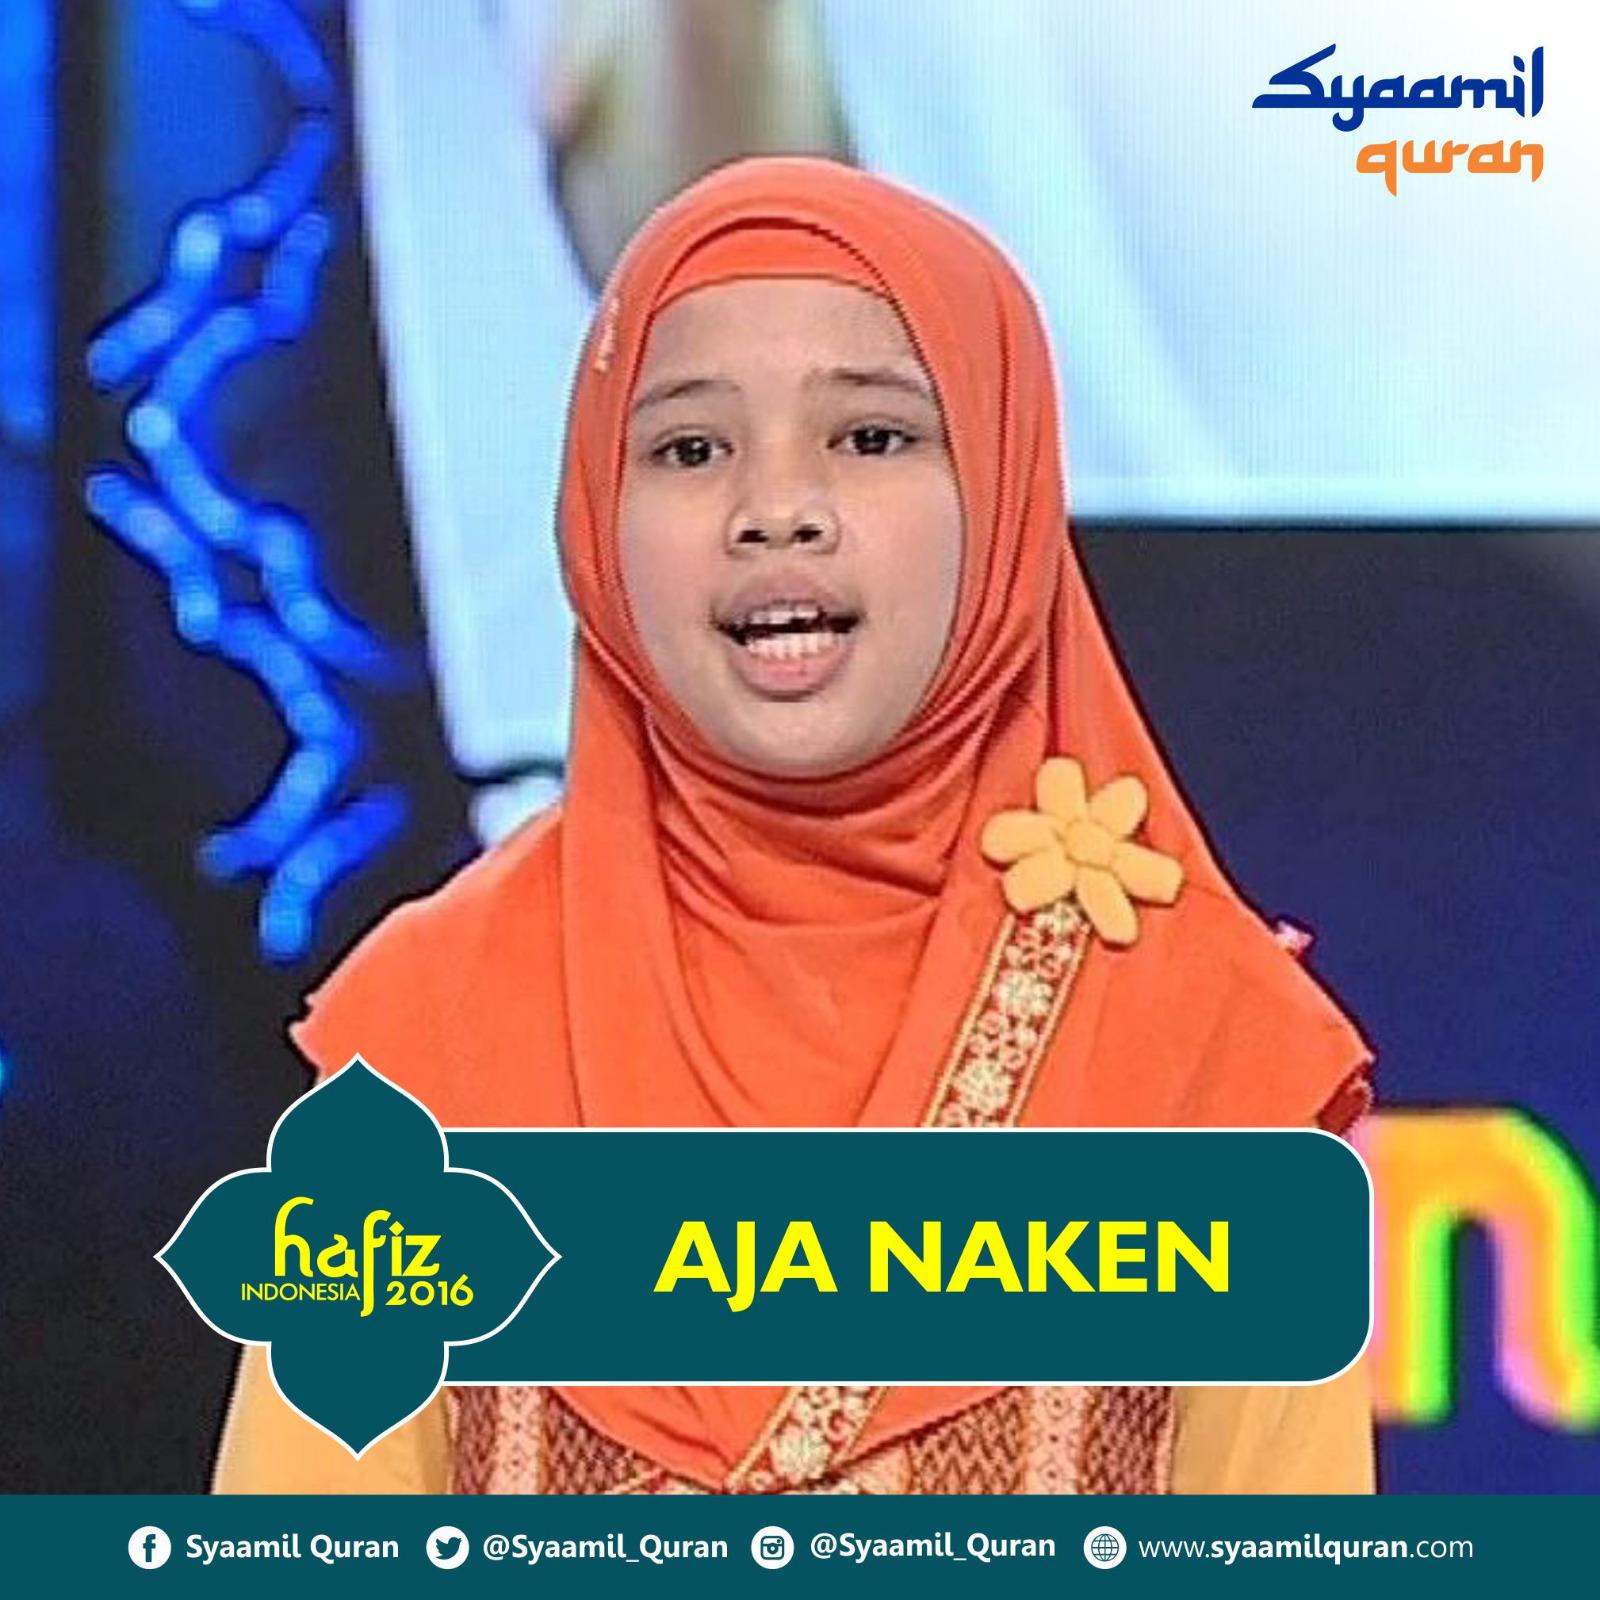 Aja Naken - Hafiz Indonesia 2016